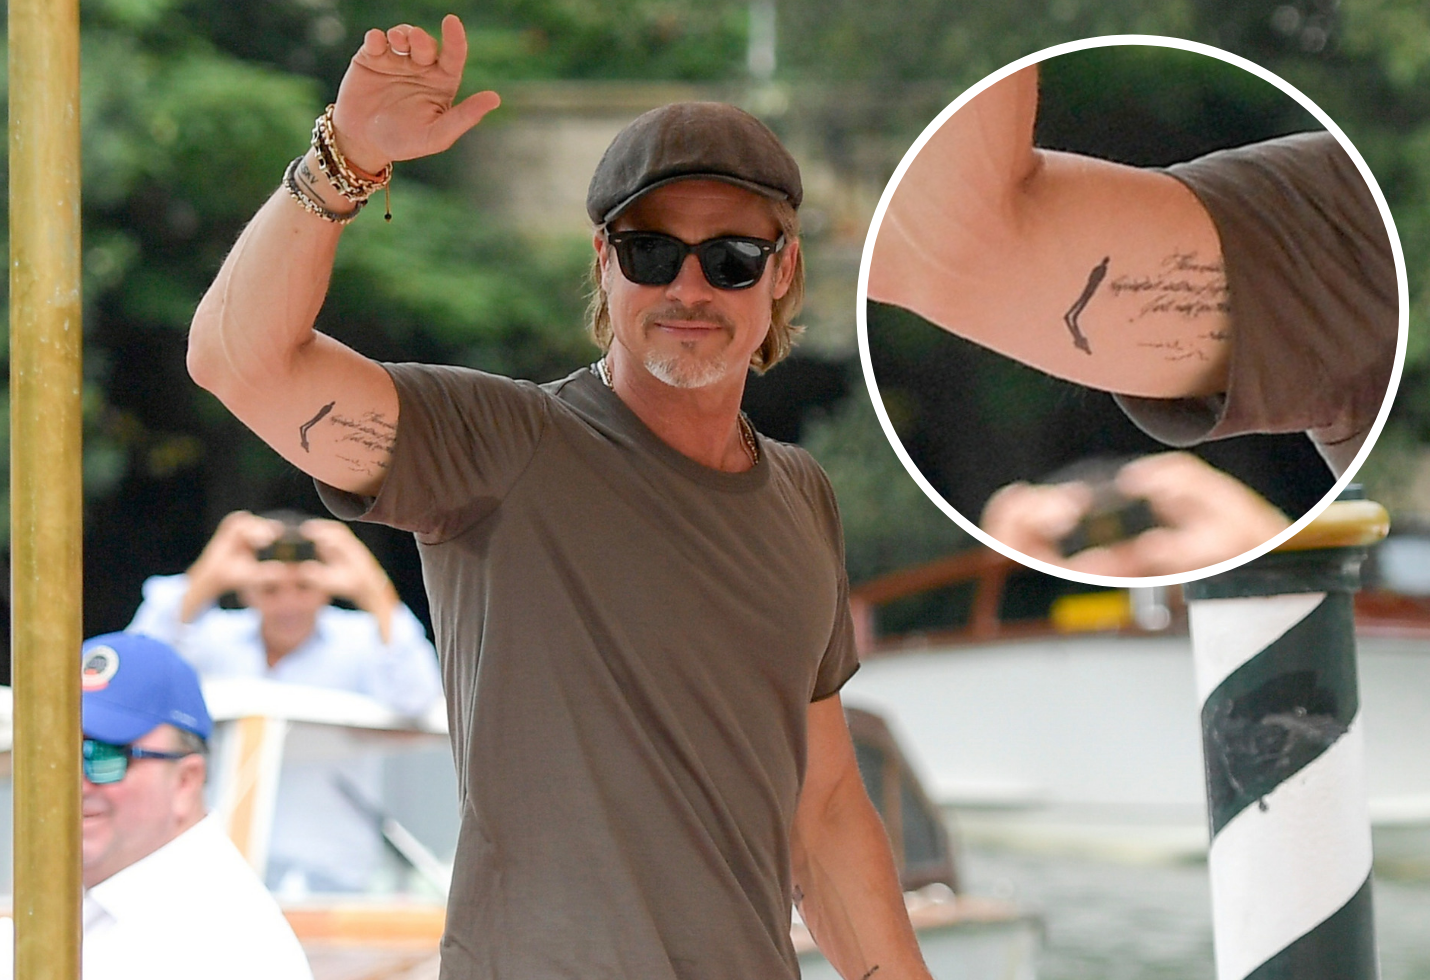 Angelina Jolie Tattoos 2019: Brad Pitt Changes Matching Angelina Jolie Tattoo: See The